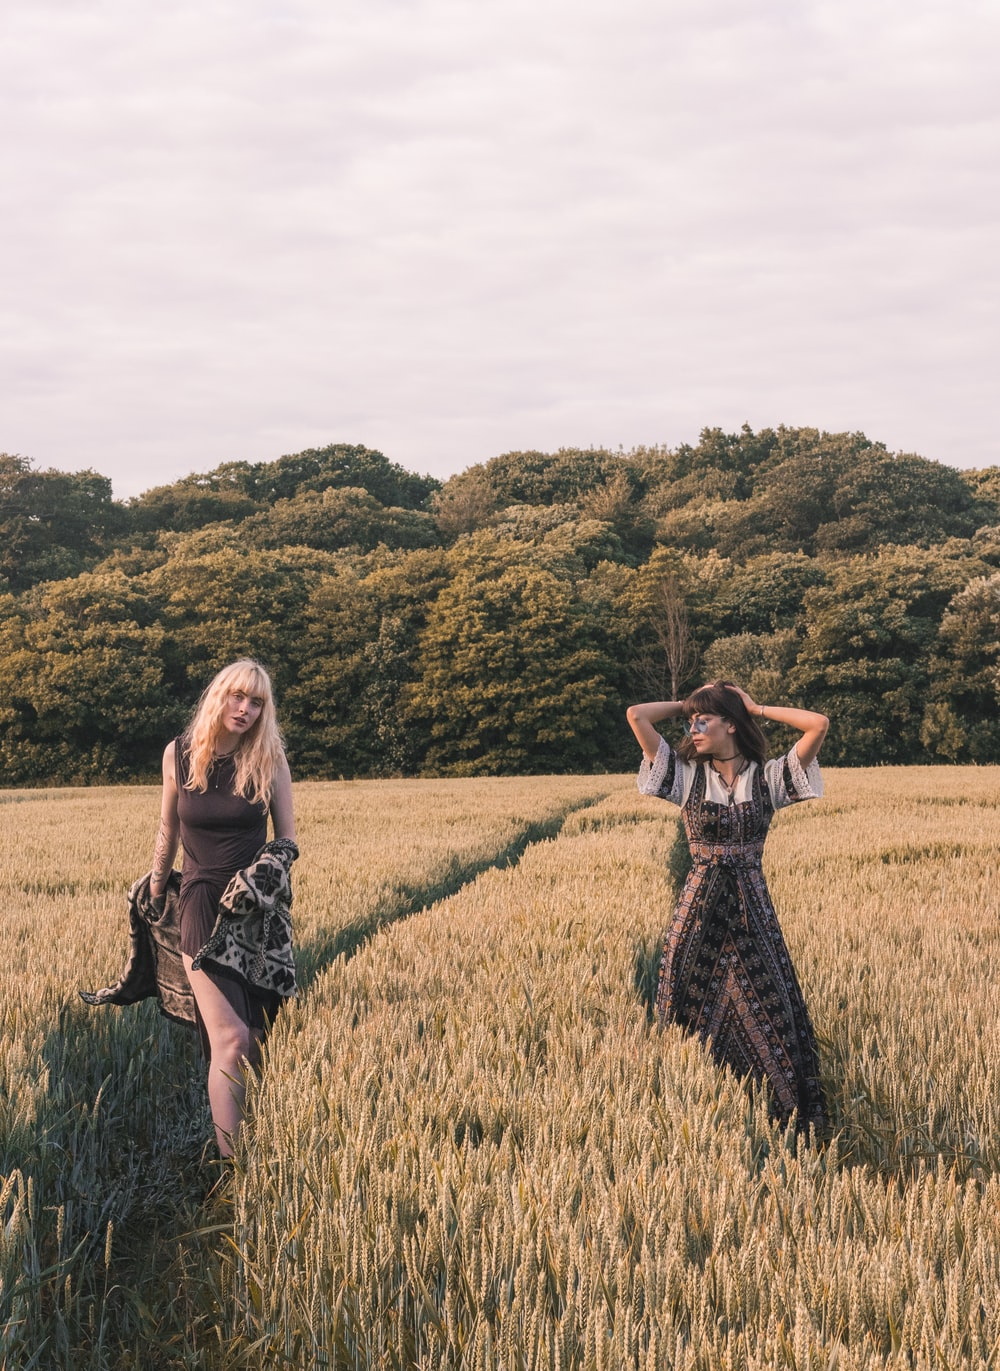 two women walking on wheat field during daytime